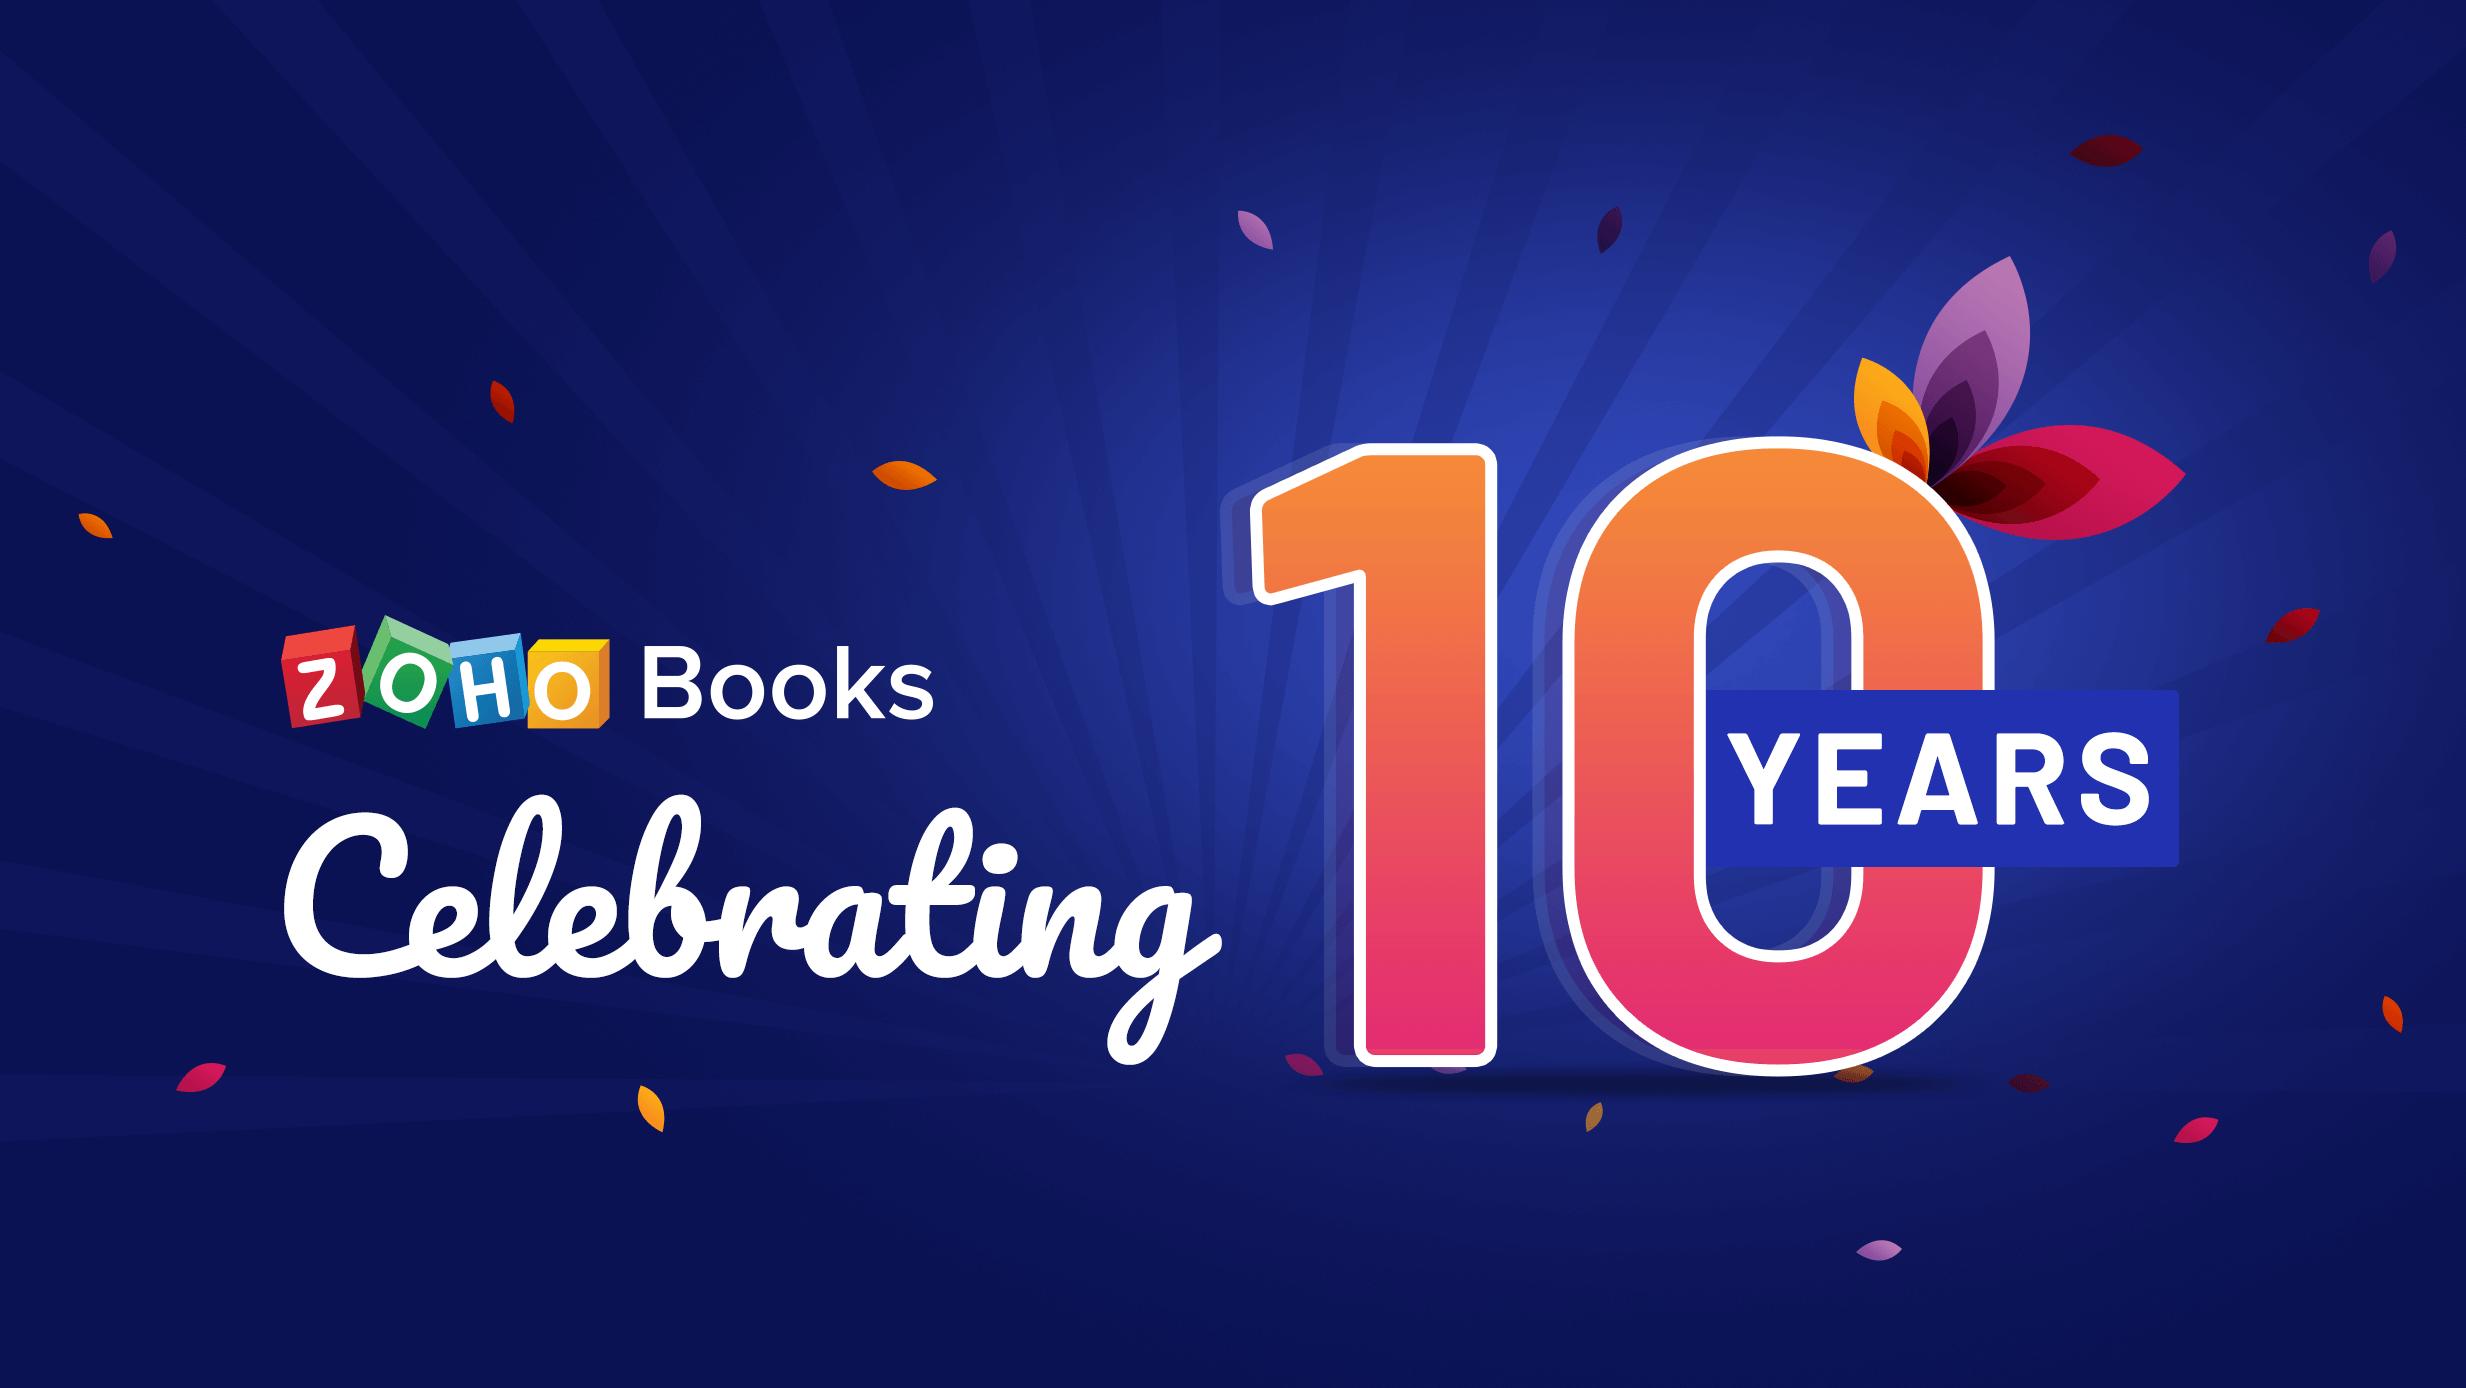 Zoho Books turns 10